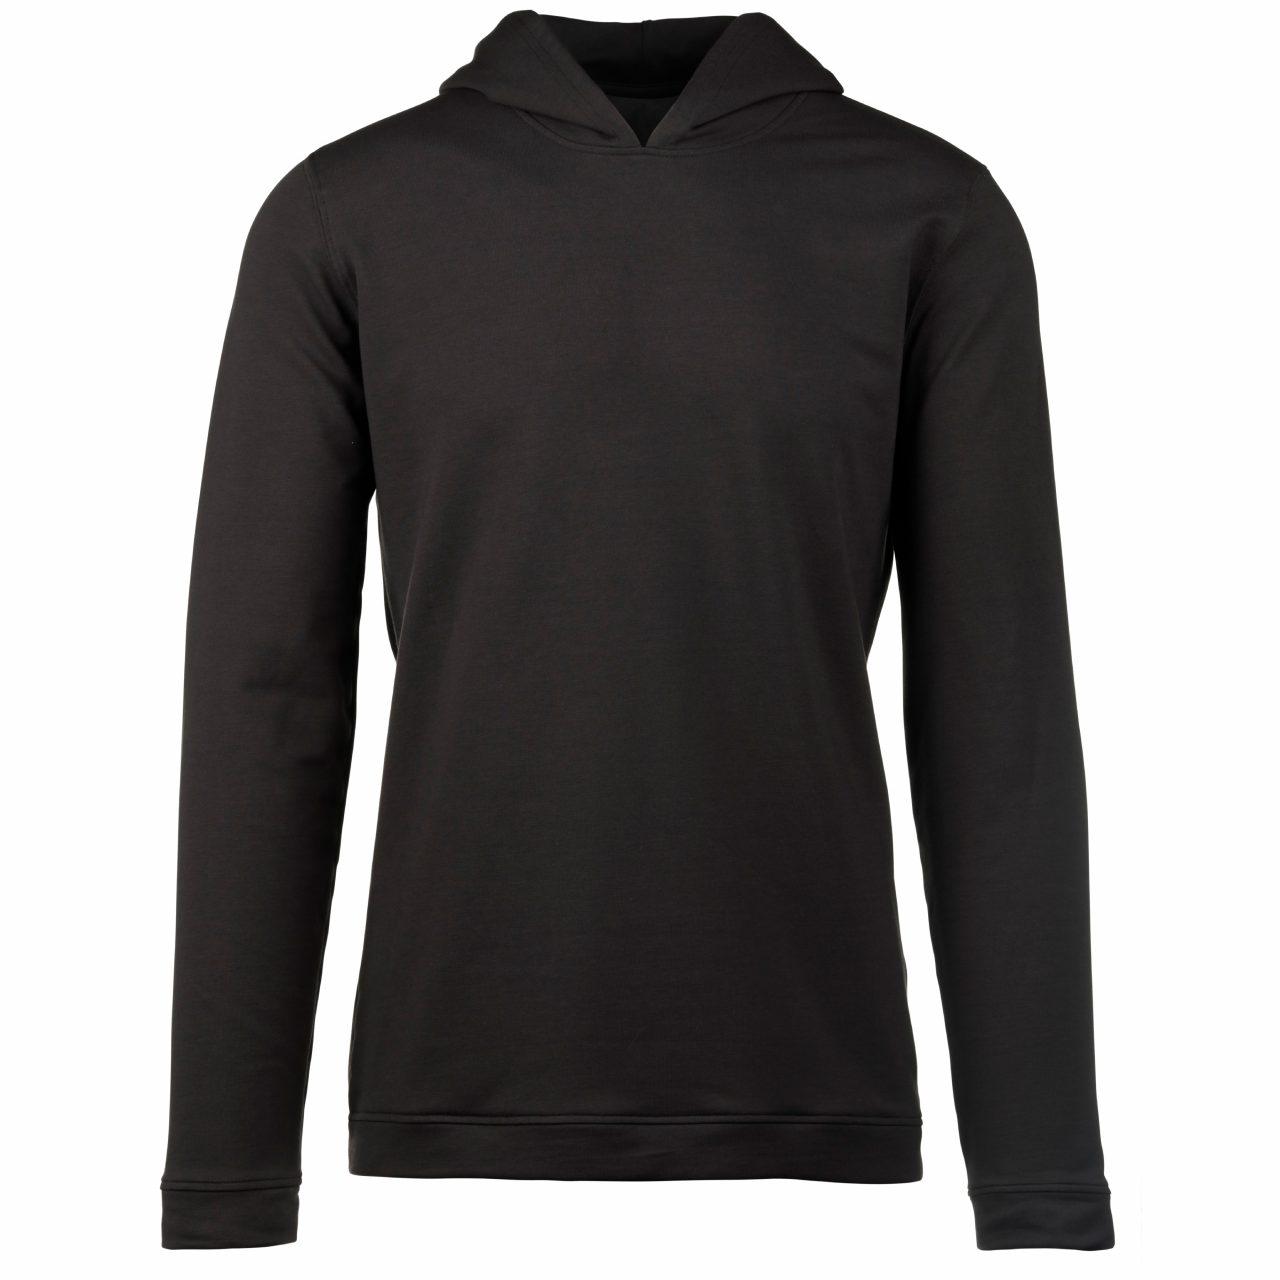 StringKing Apparel Hoodie Sweatshirt Light Black Front View